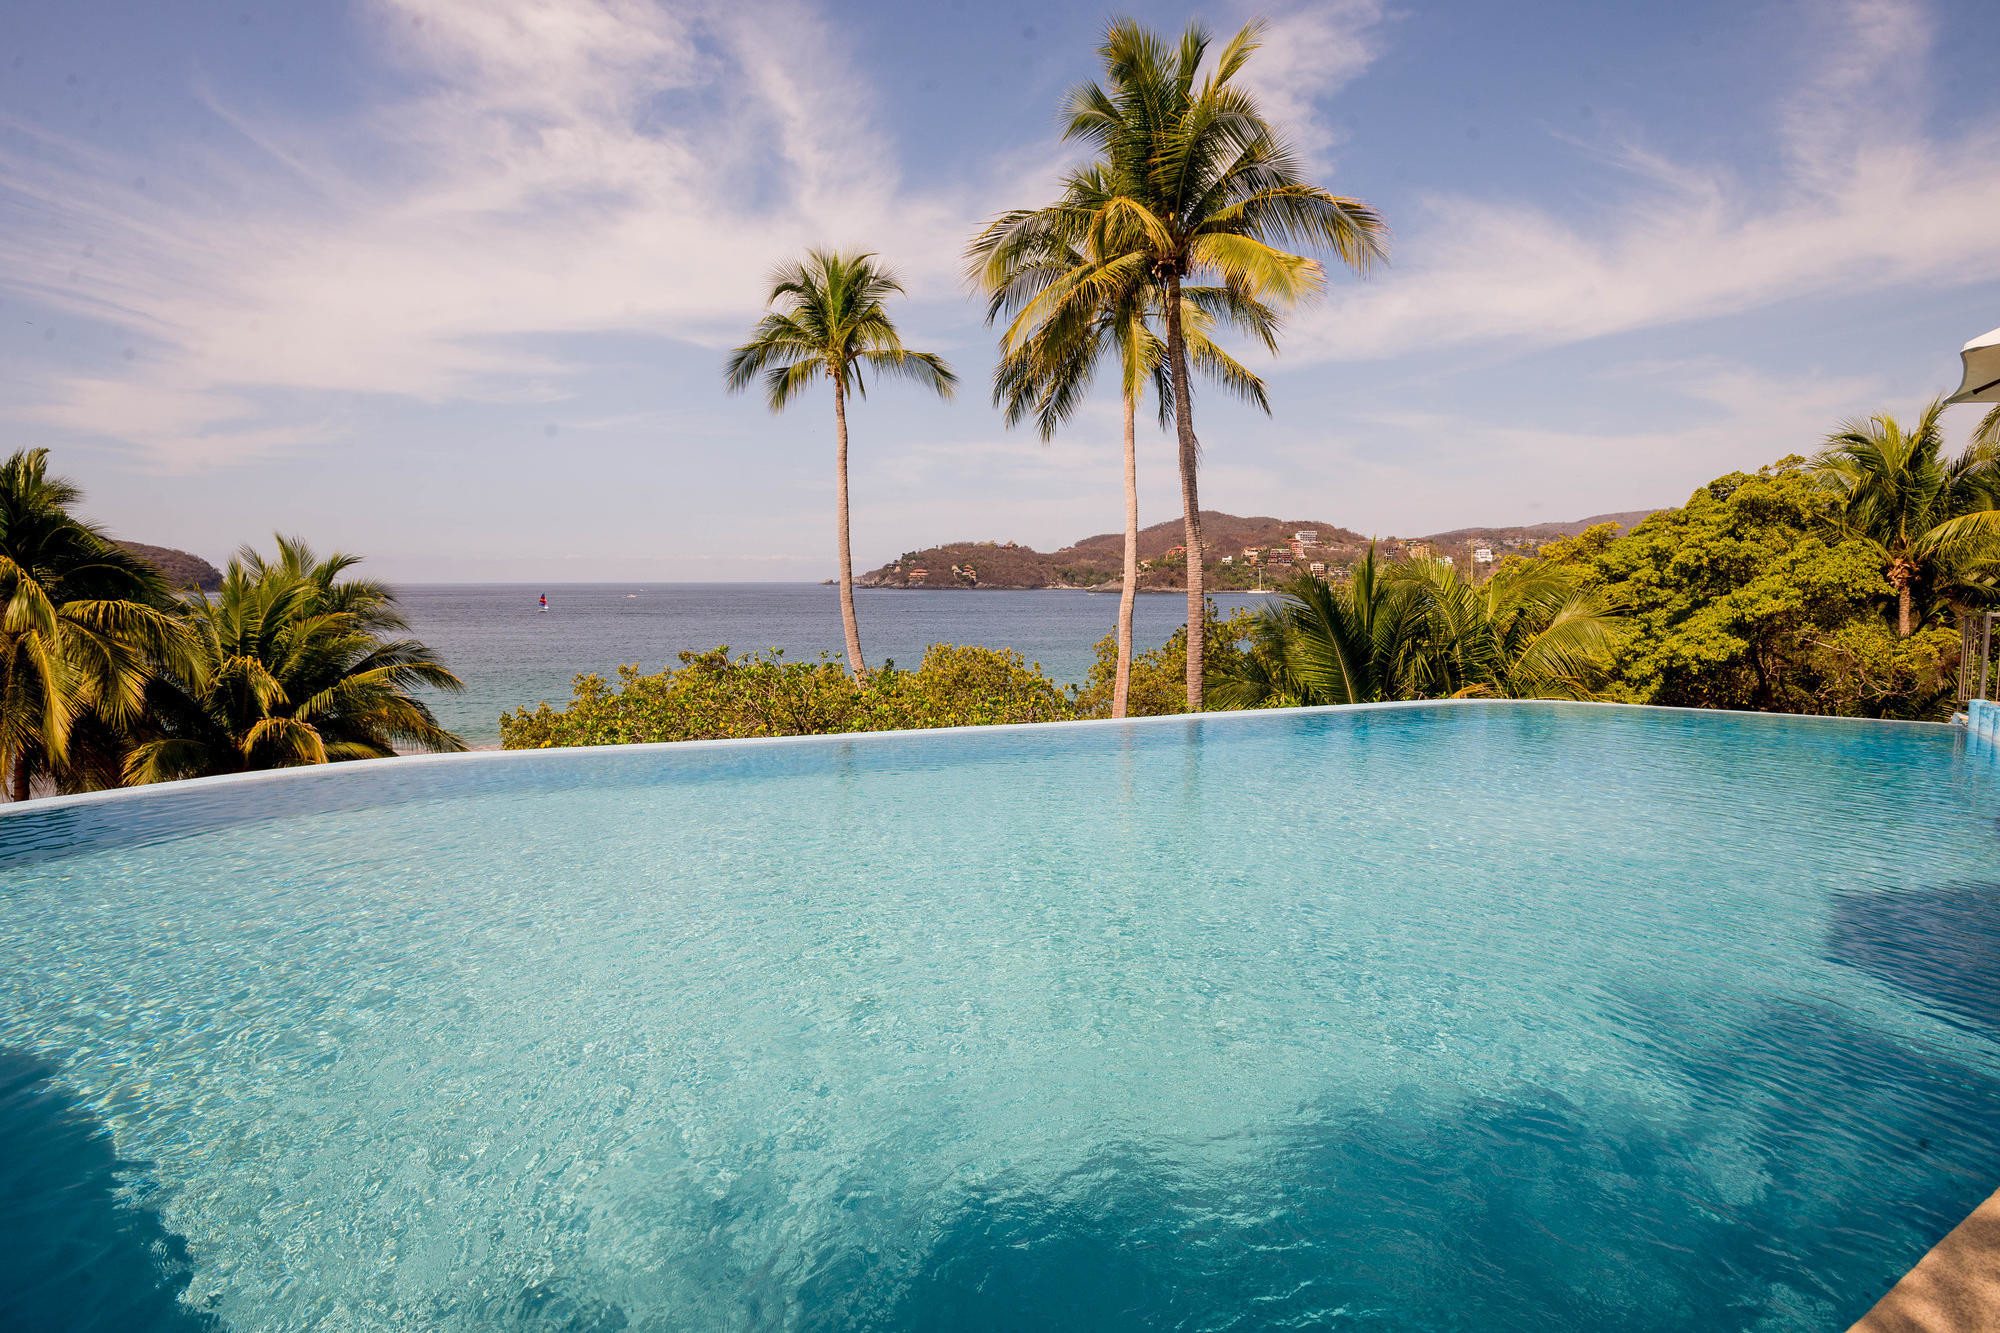 Catalina Beach Resort Review What To